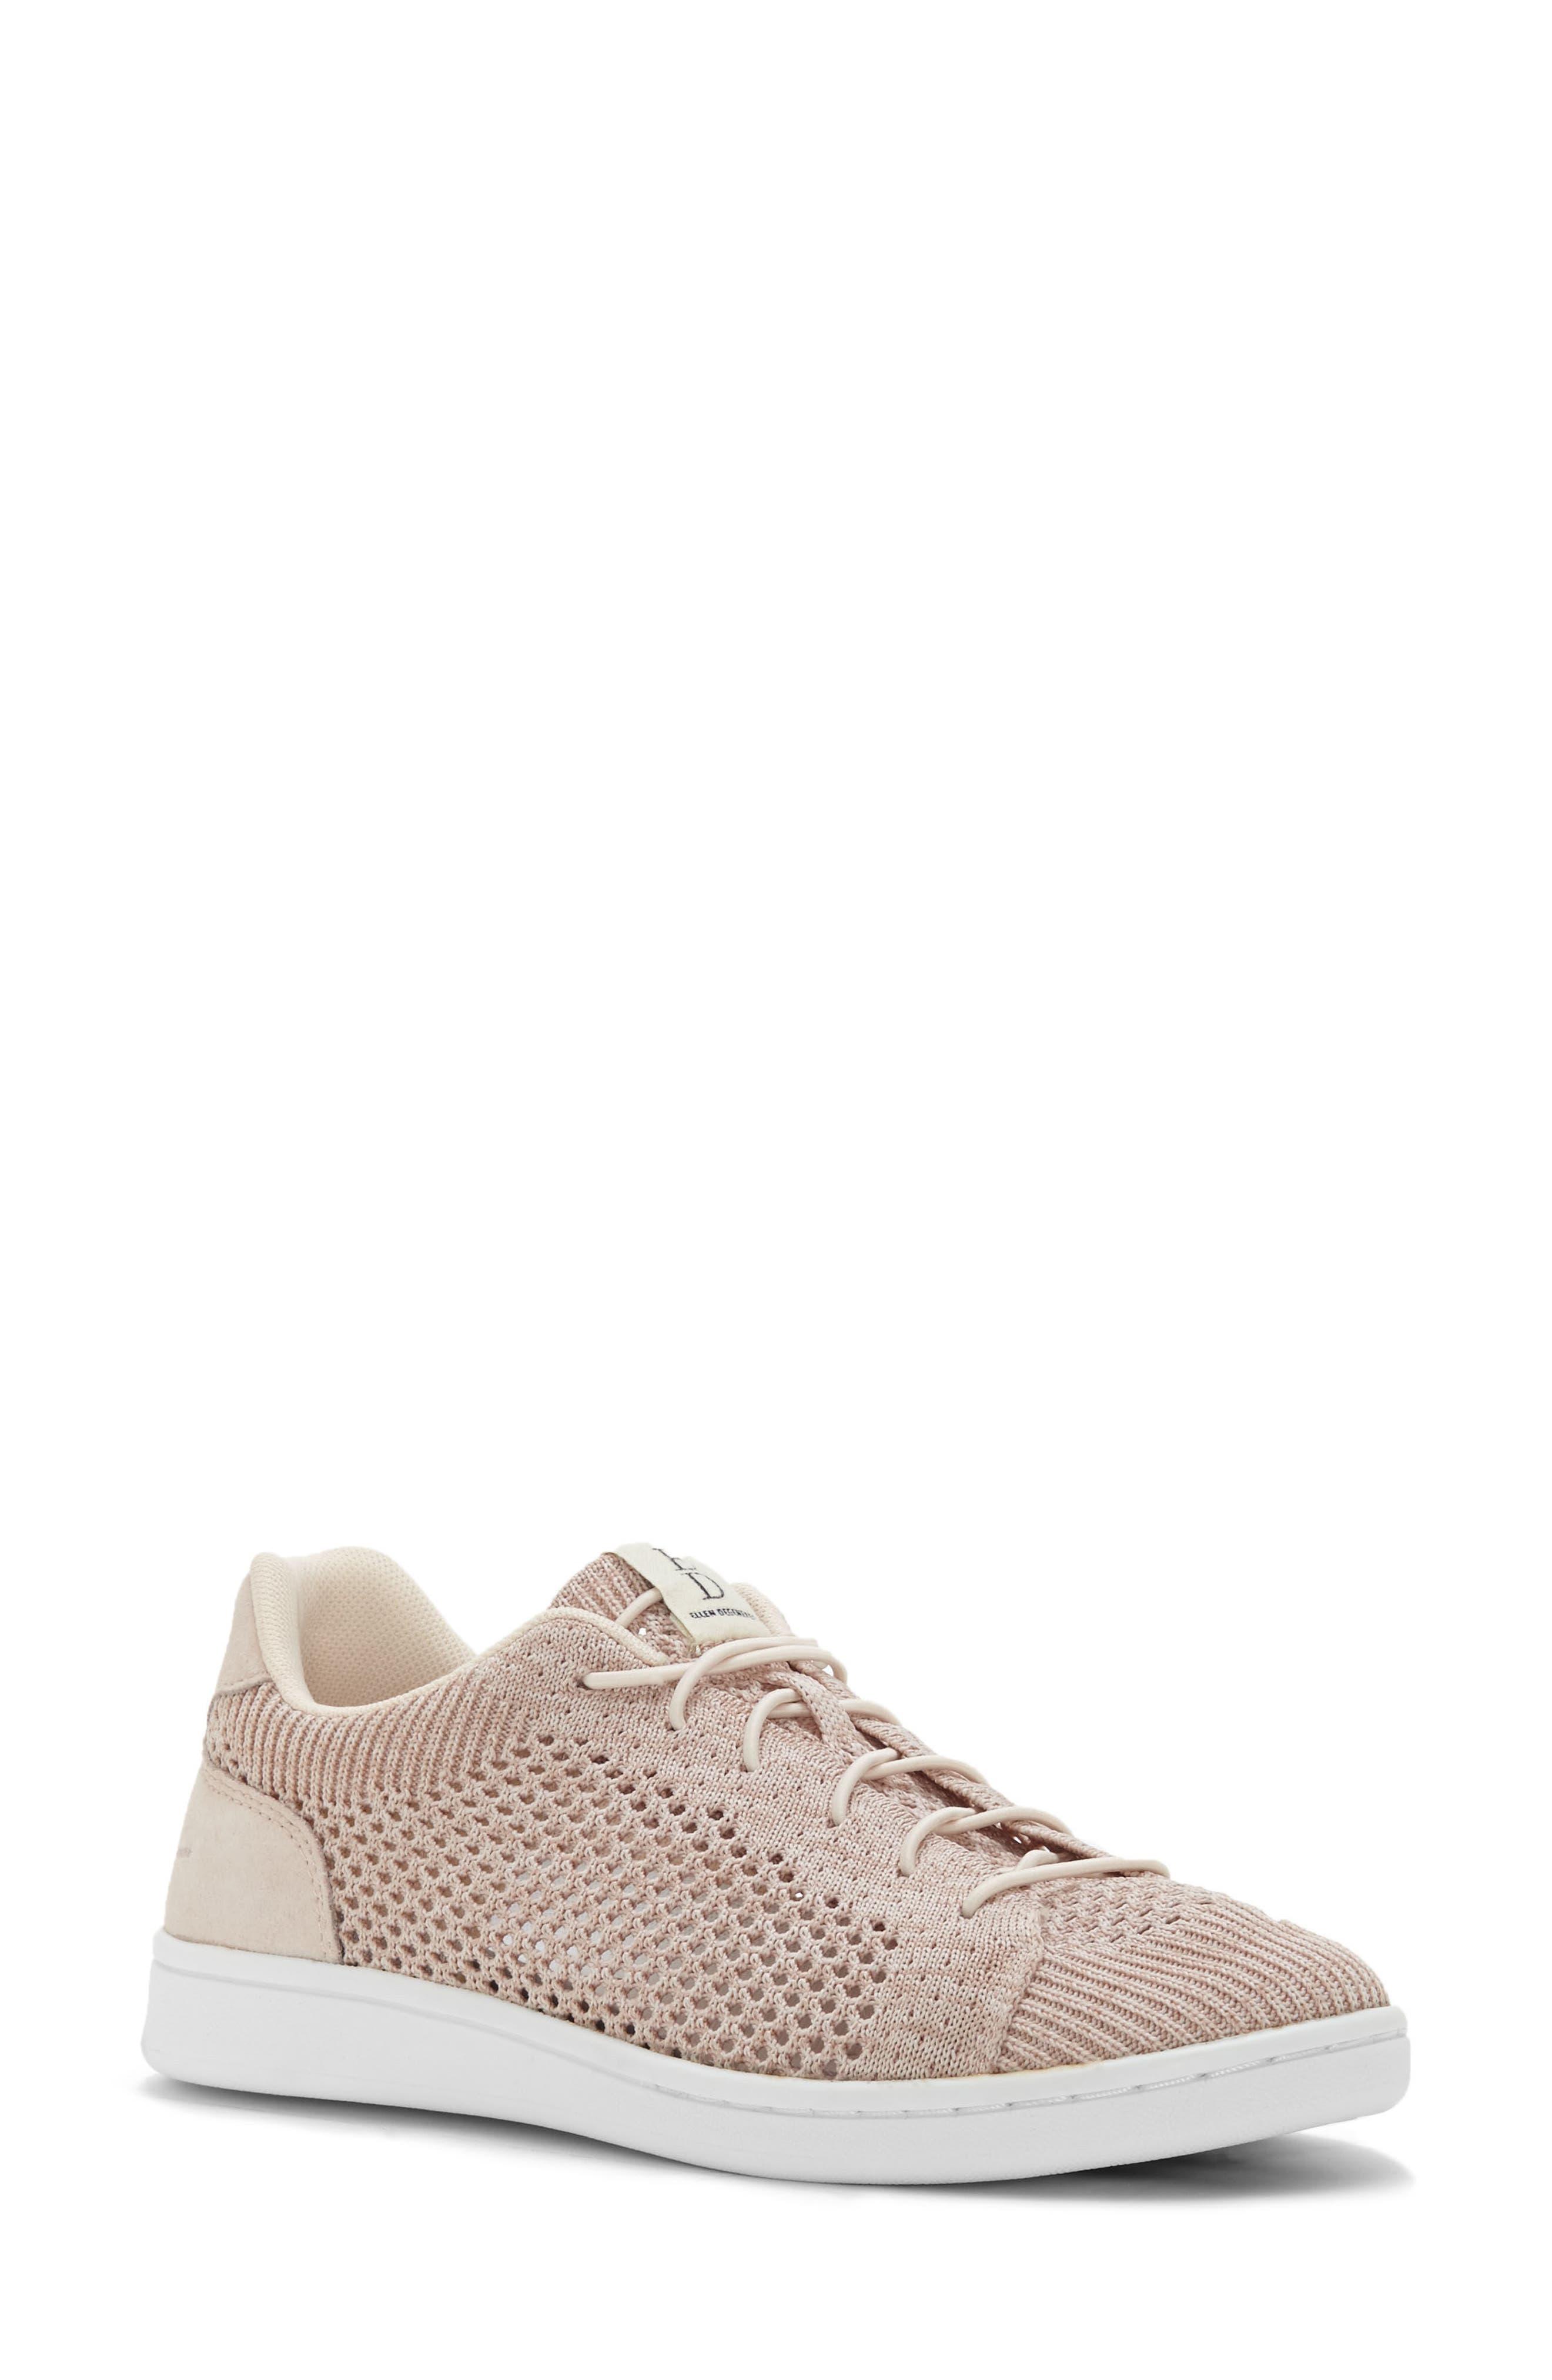 Alternate Image 1 Selected - ED Ellen DeGeneres Casie Knit Sneaker (Women)